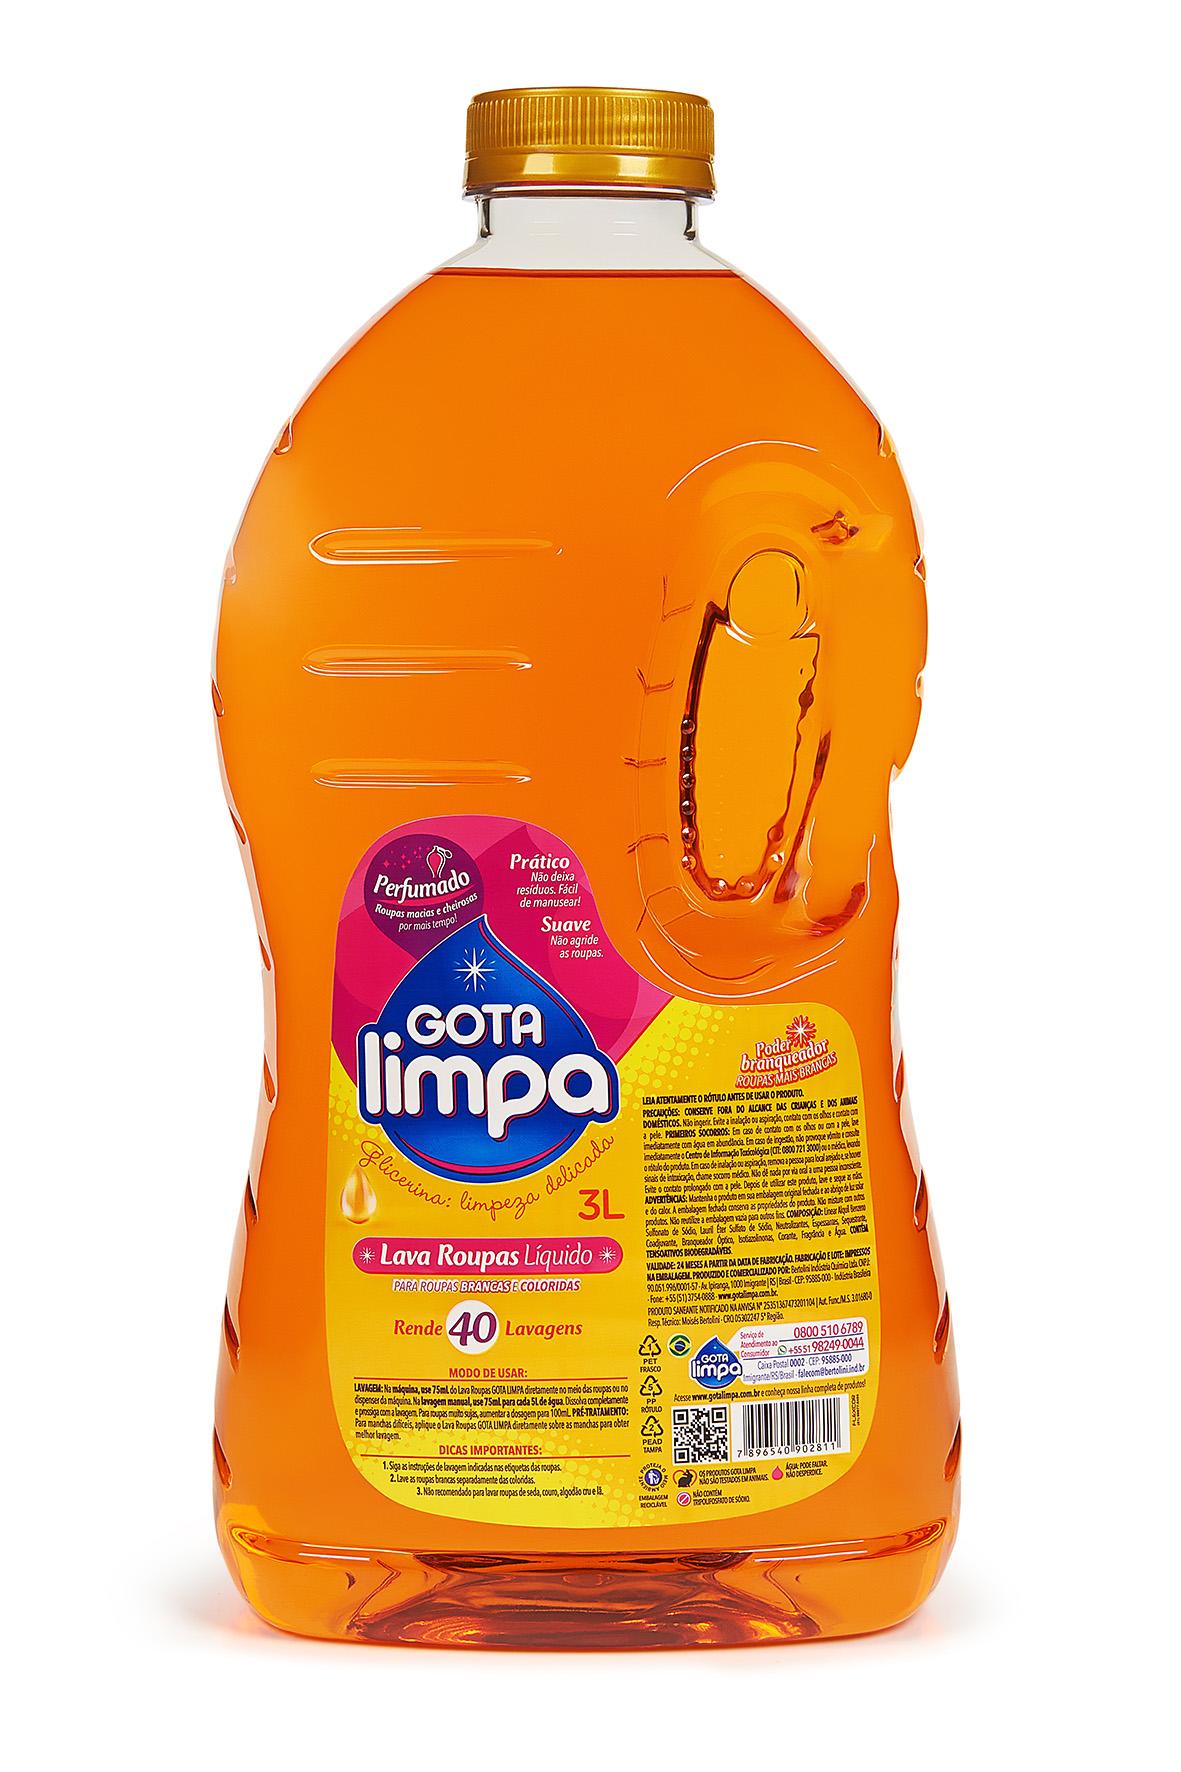 Gota Limpa Liquid Laundry Detergent Glycerin 3L